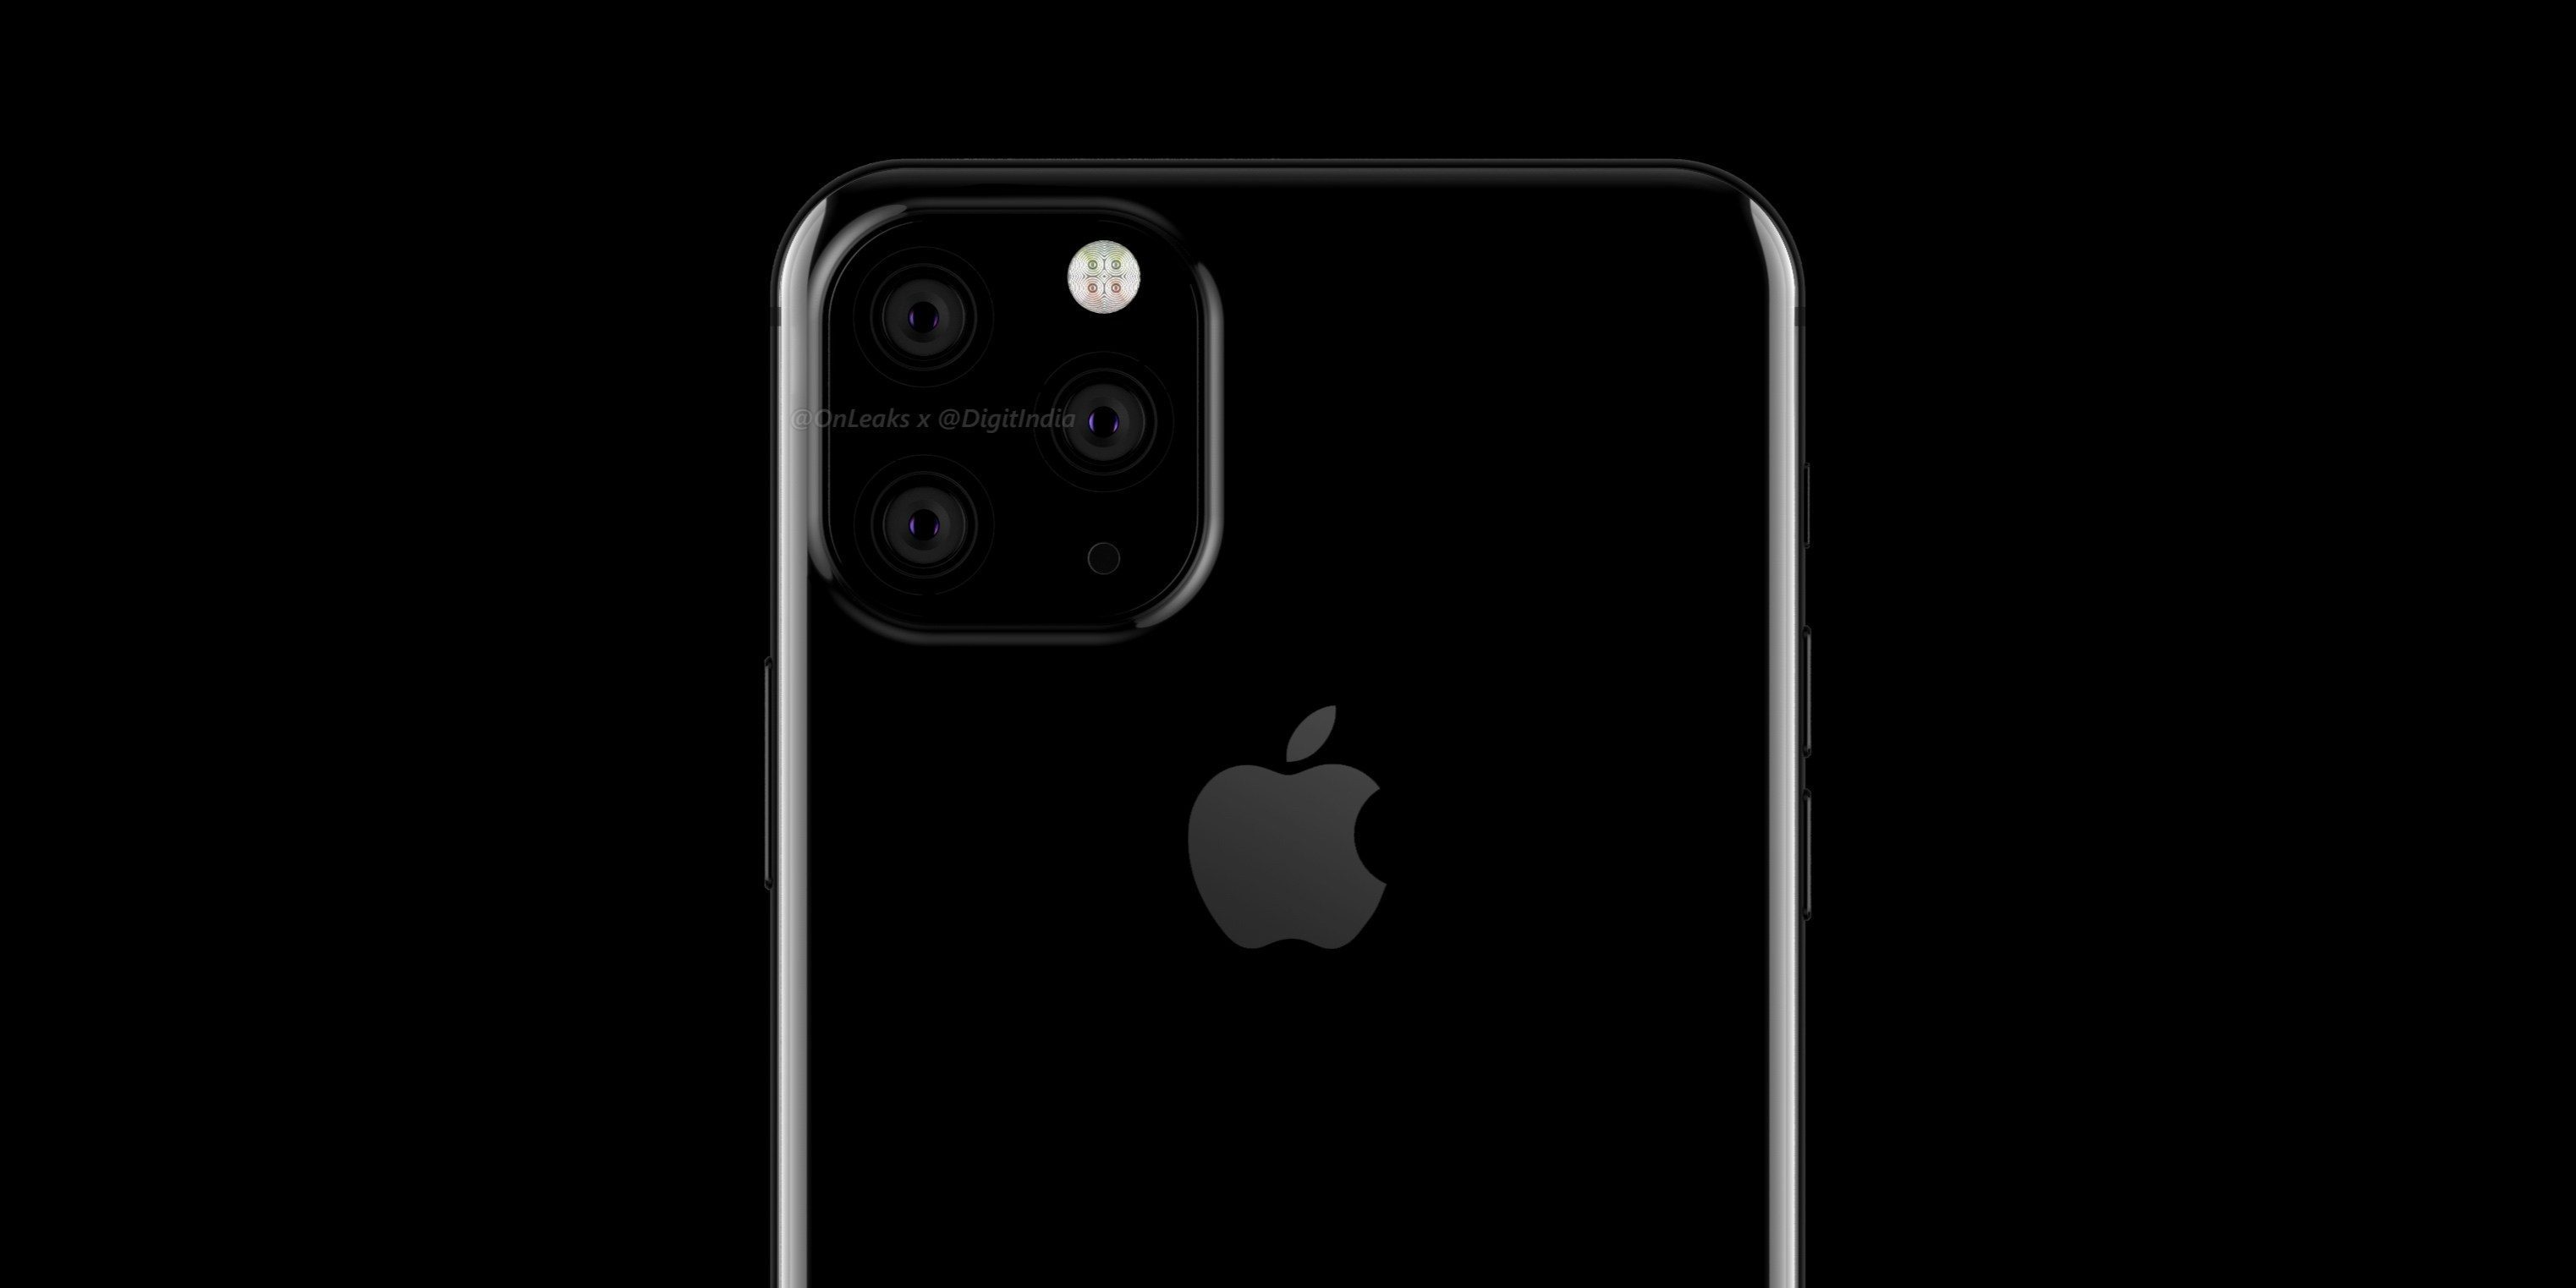 Leaked iPhone 11 models show up in Eurasian database 16